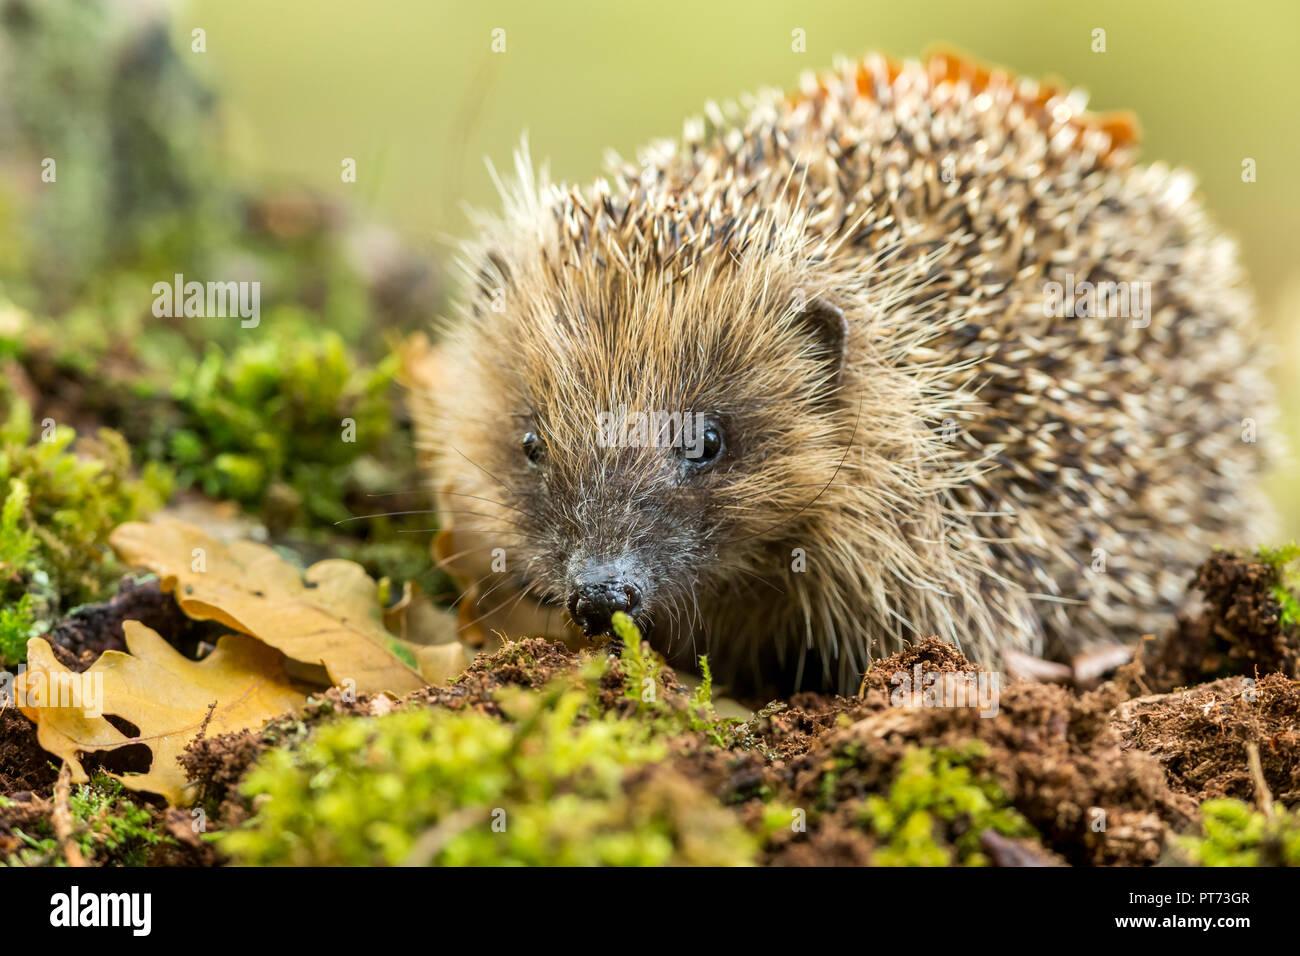 Hedgehog, wild, native, European hedgehog in natural woodland habitat during Autumn or Fall.  Scientific name: Erinaceus Europaeus. Horizontal. - Stock Image